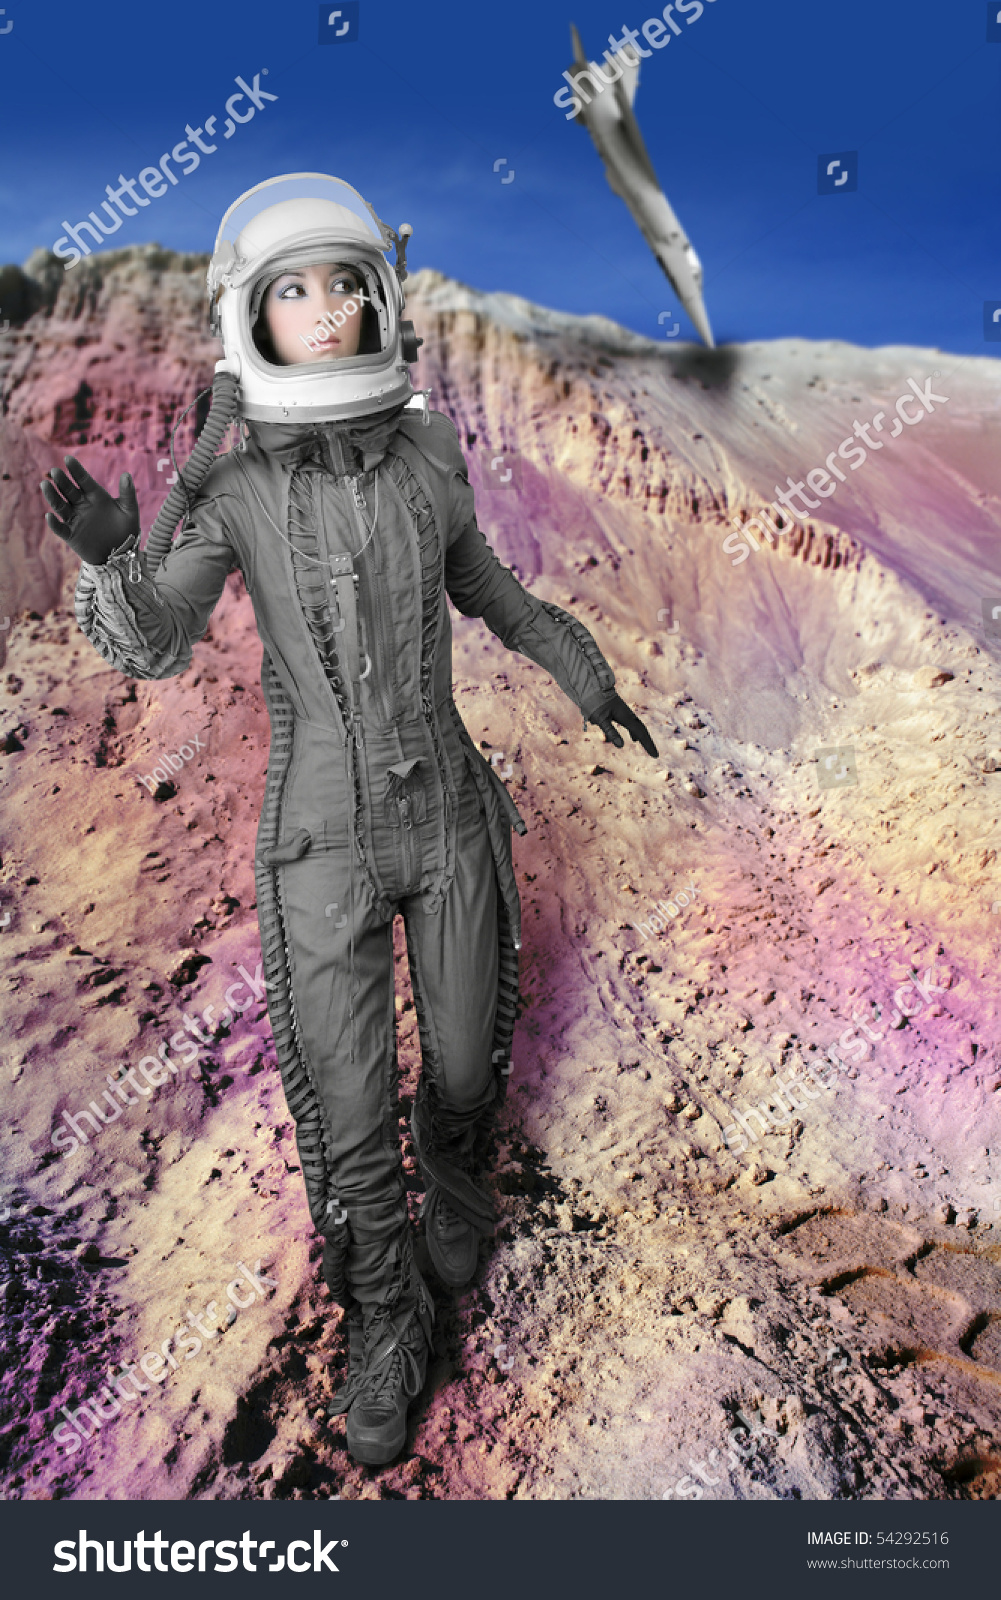 astronaut space fashion - photo #11